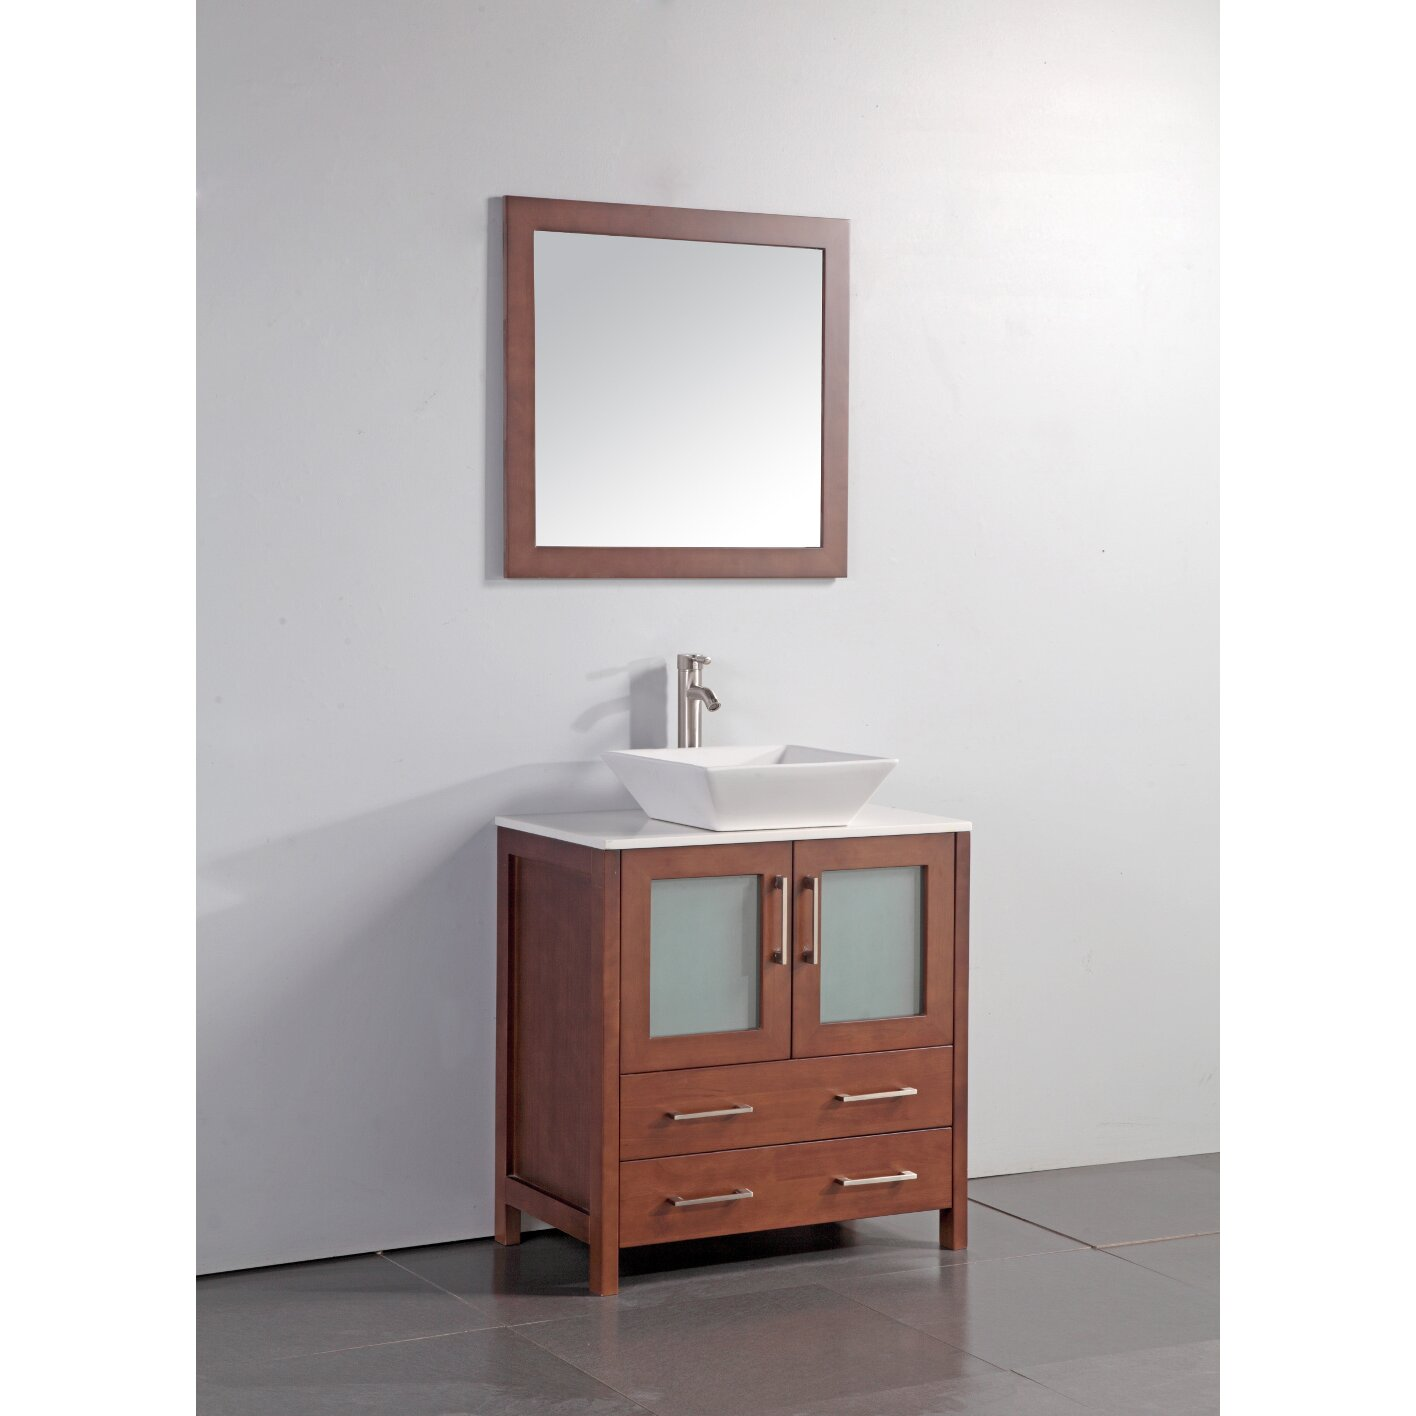 Legion furniture 30 single bathroom vanity set with for Bathroom furniture sets